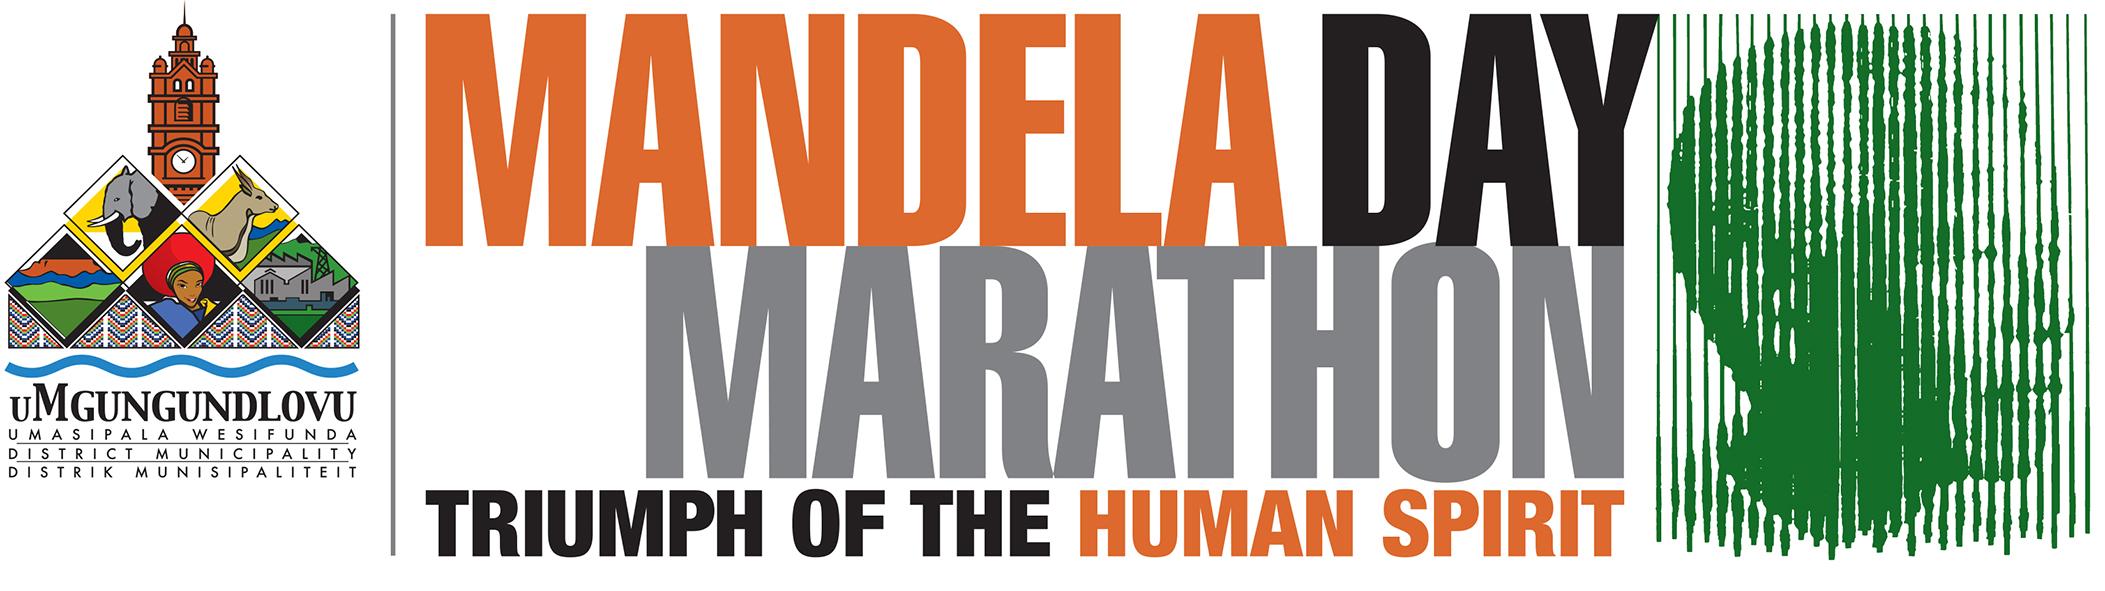 Mandela logo